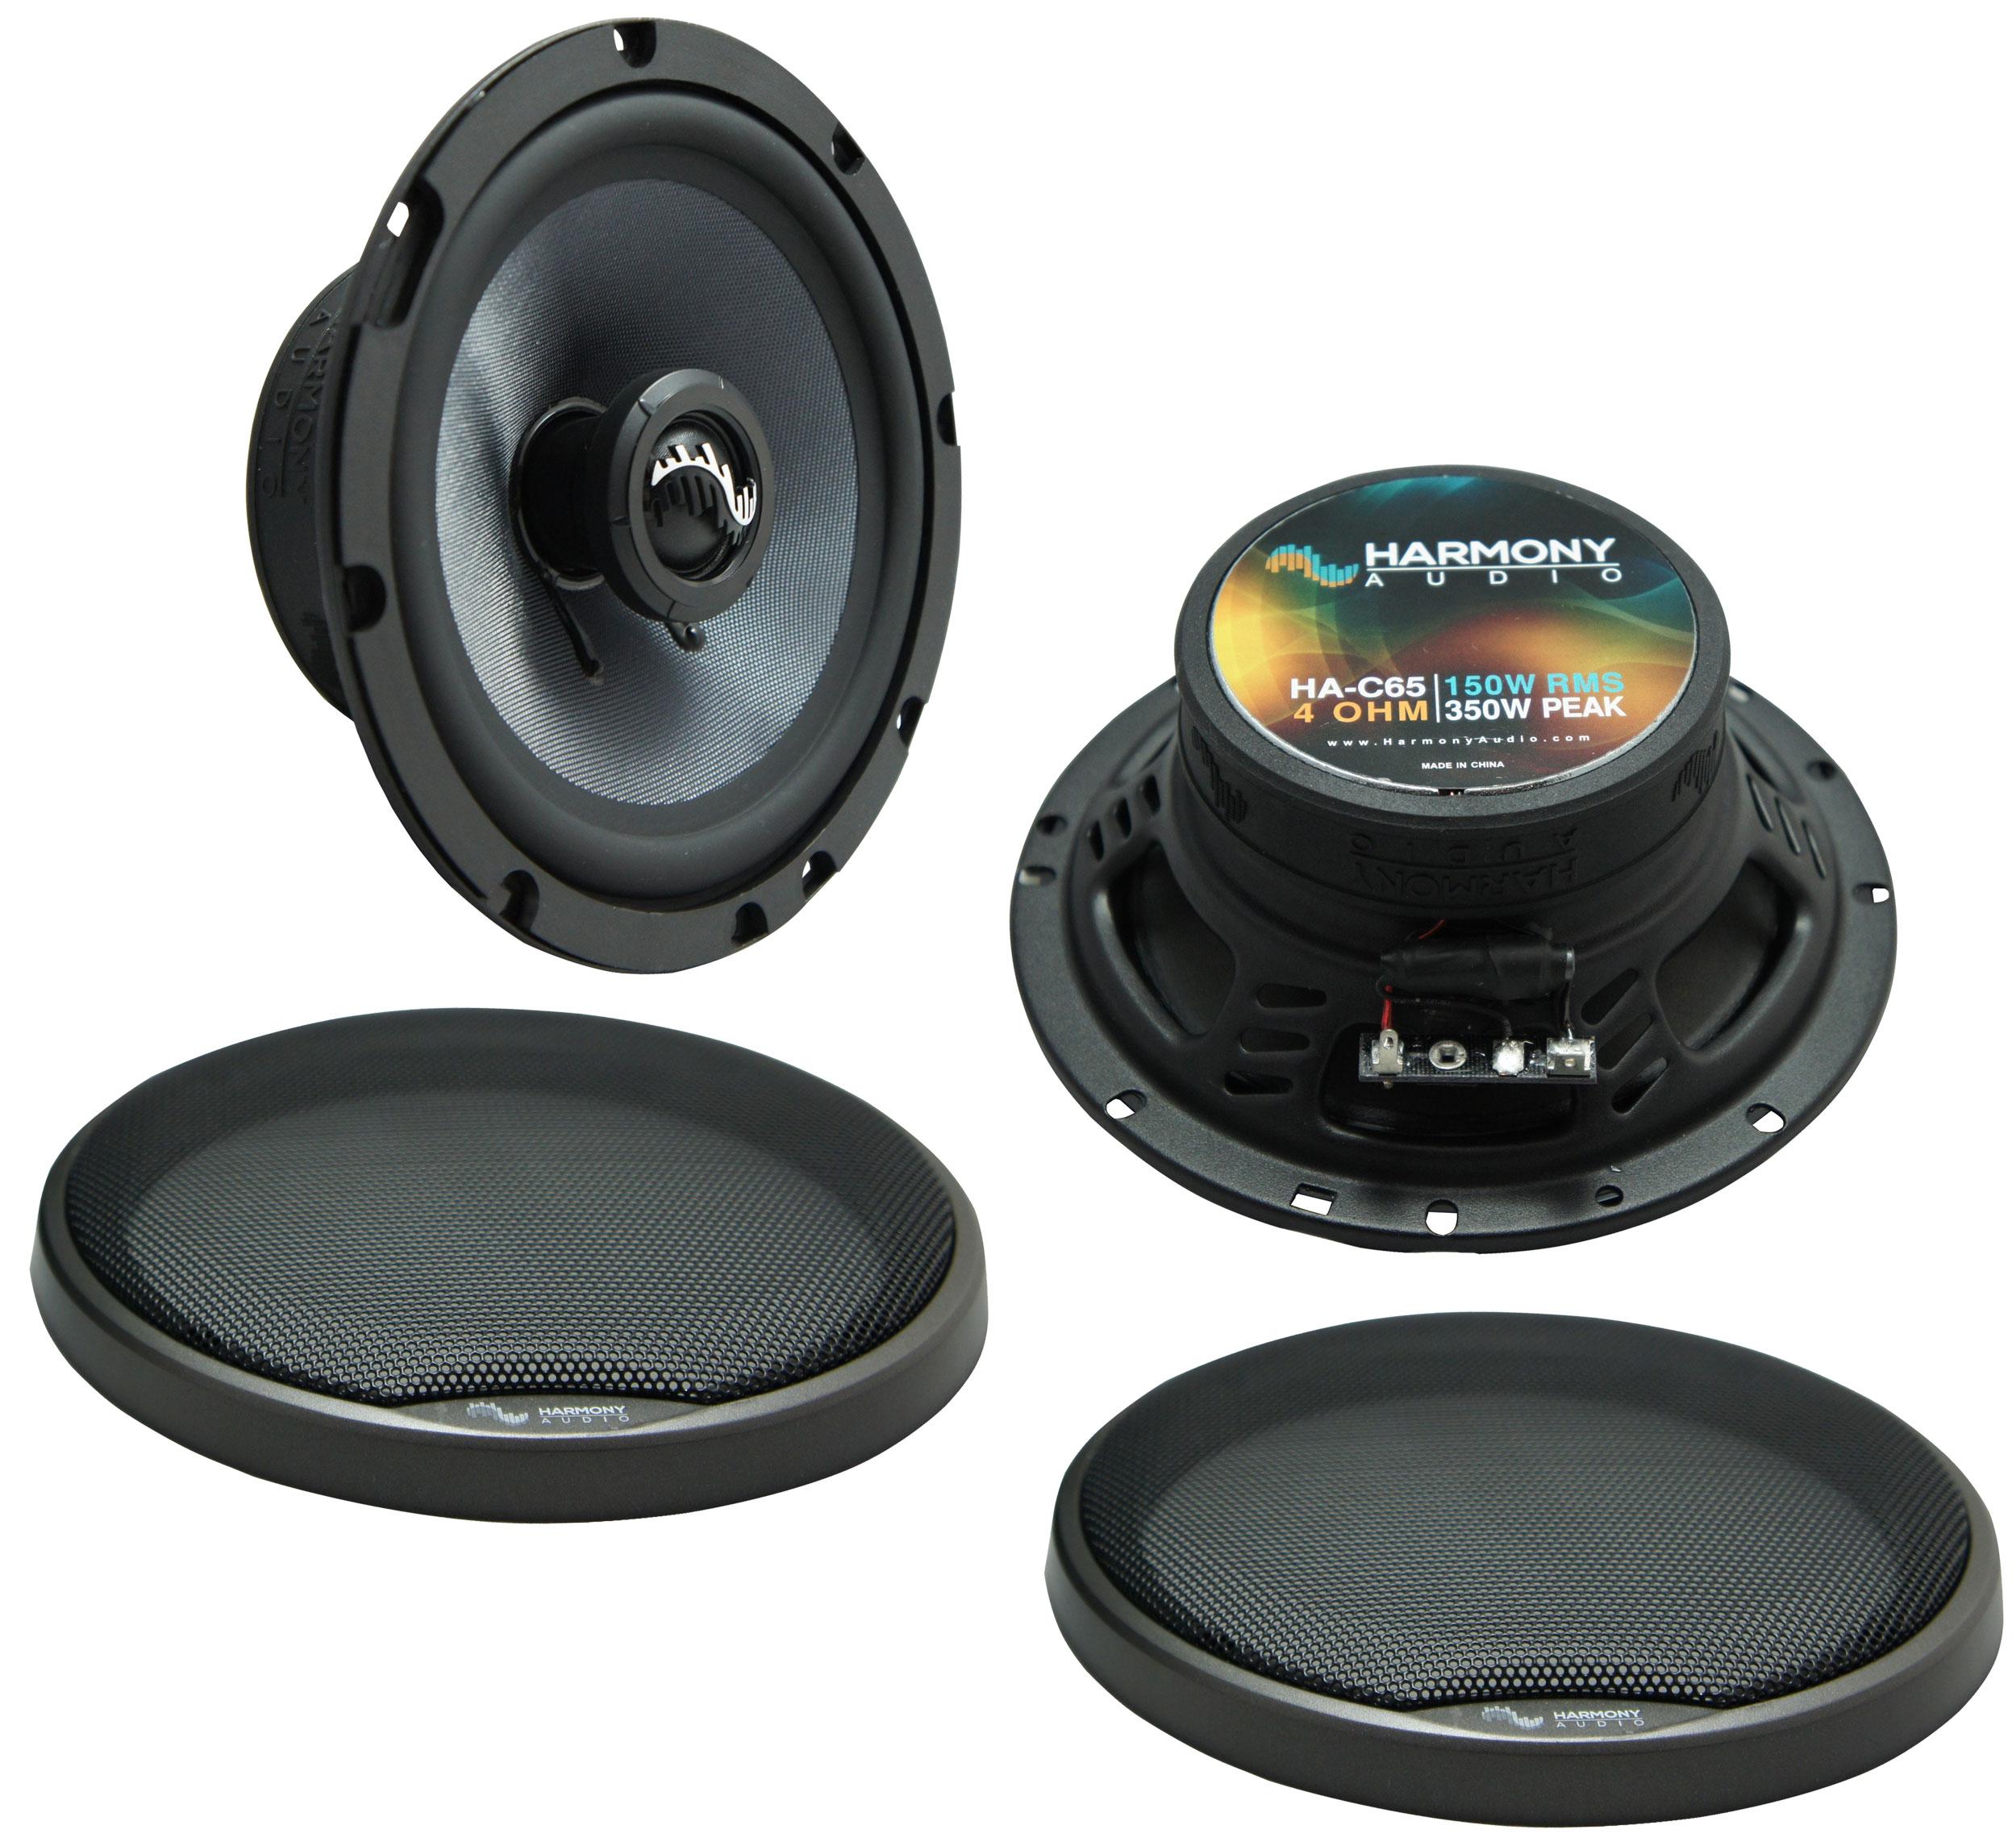 Fits BMW X5 2000-2016 Rear Door Replacement Speaker Harmony HA-C65 Premium Speakers New